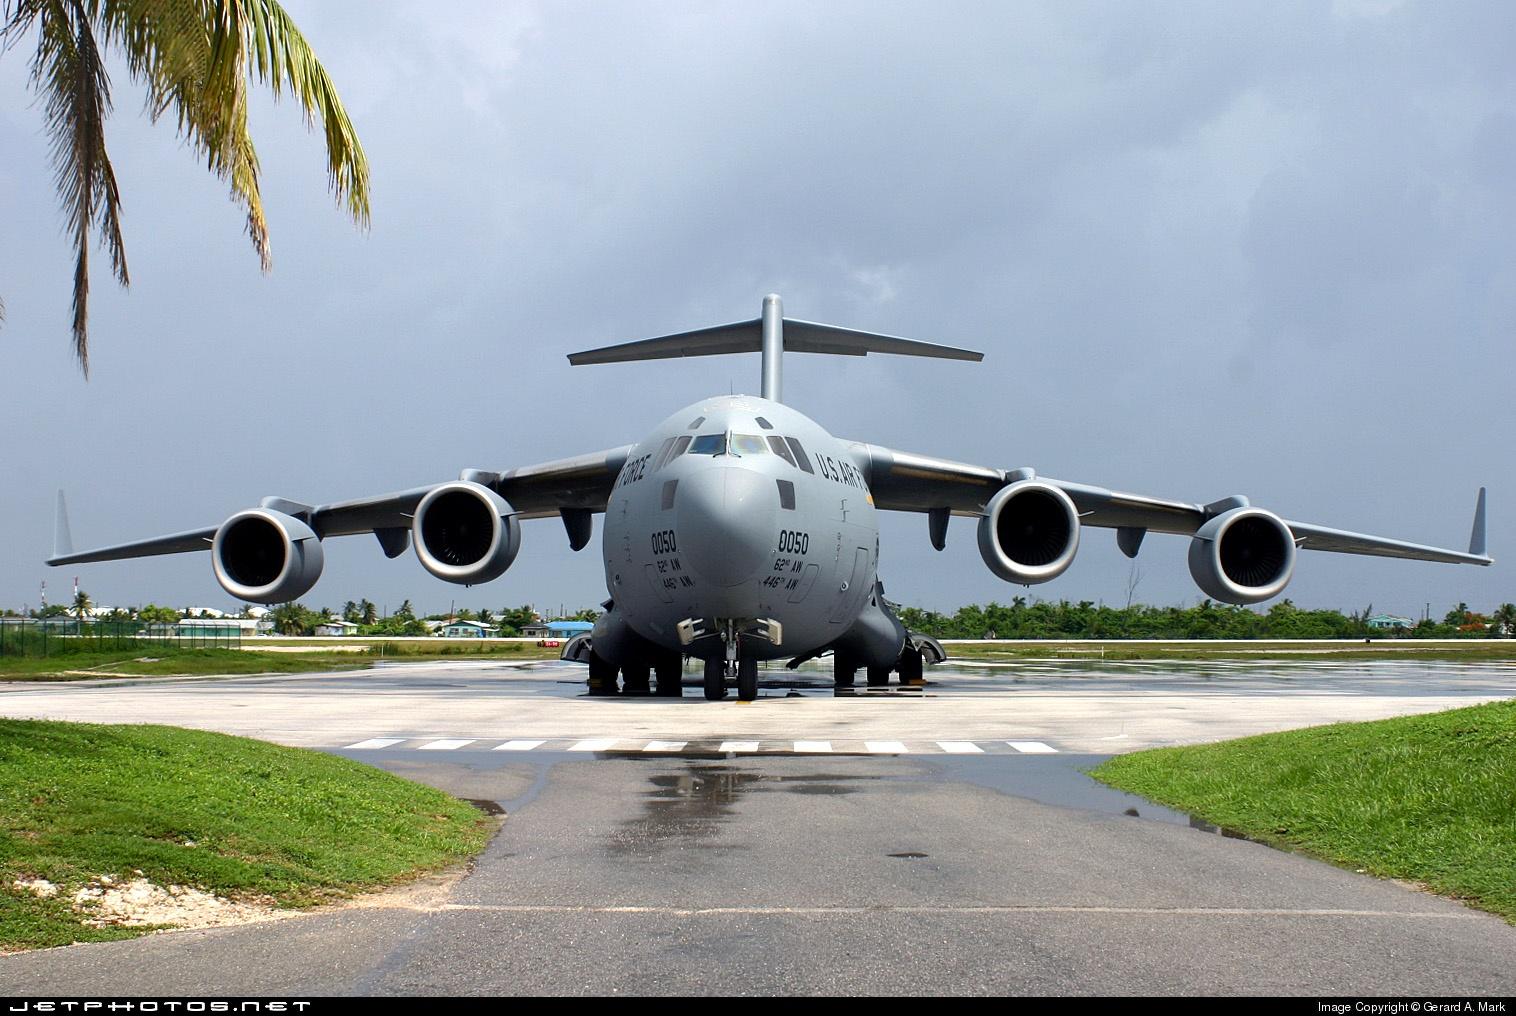 98-0050 - Boeing C-17A Globemaster III - United States - US Air Force (USAF)